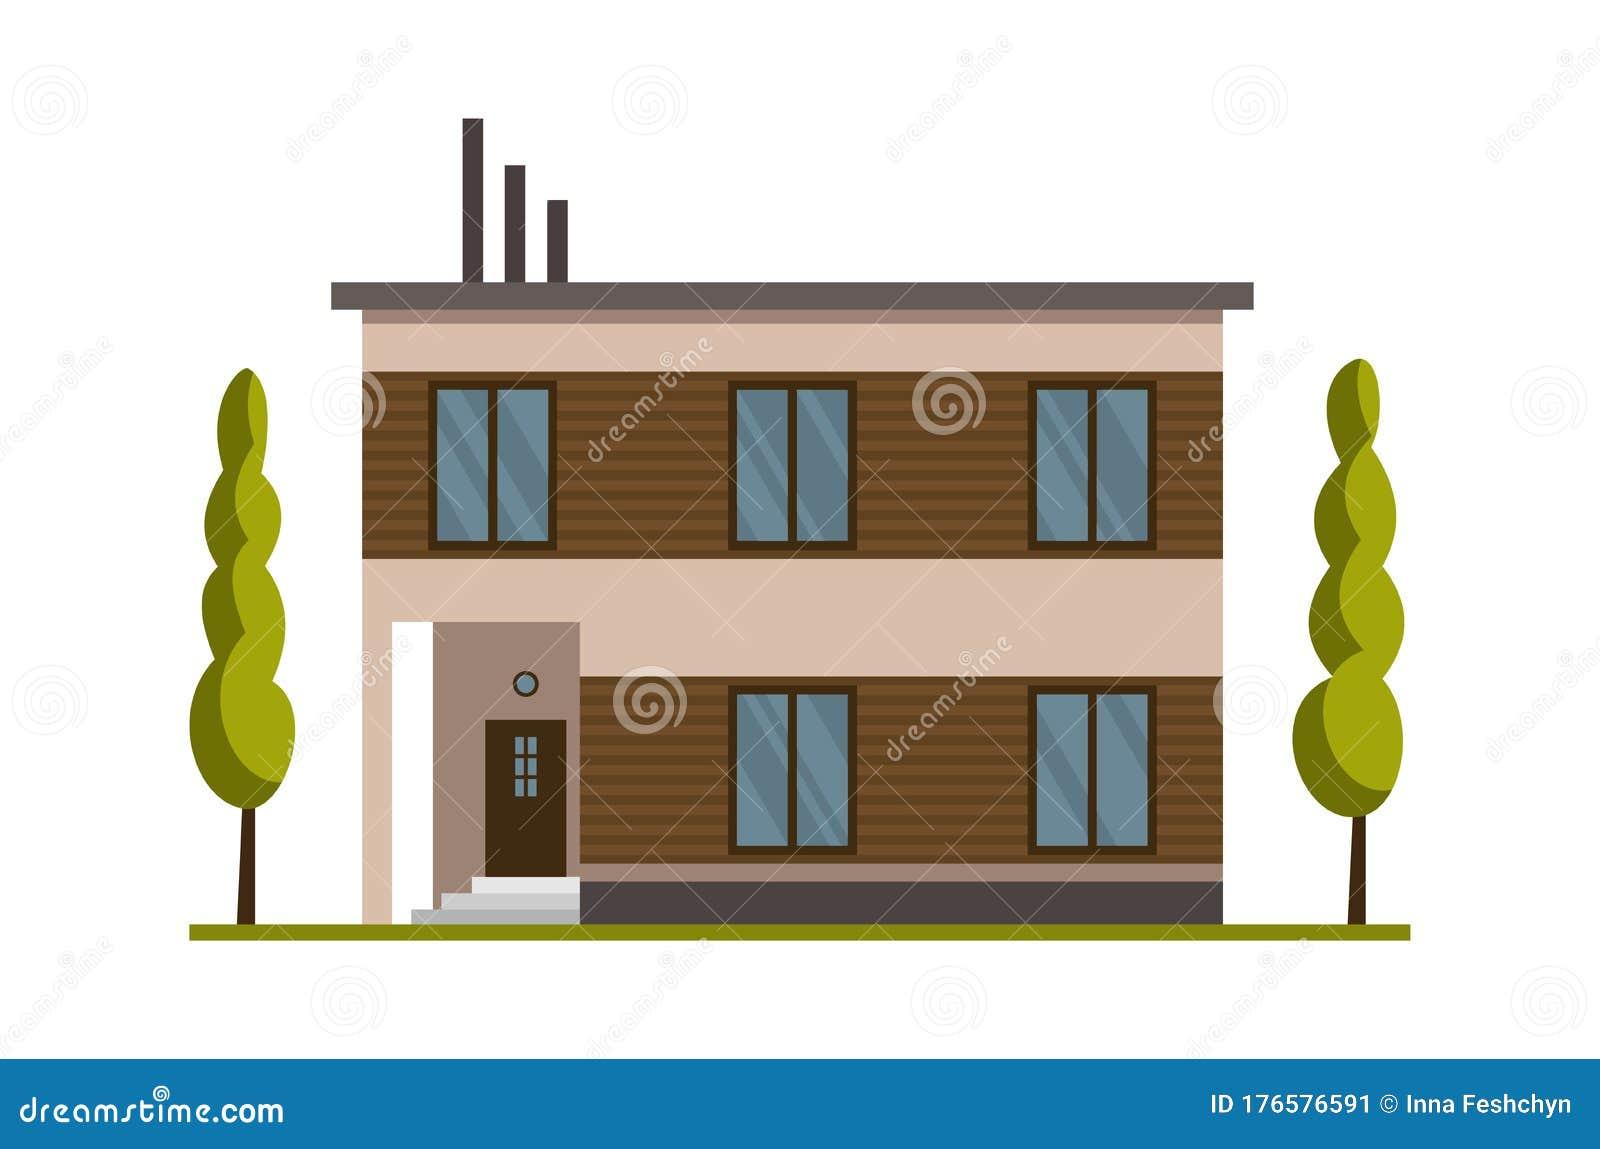 House Flat Roof Stock Illustrations 35 664 House Flat Roof Stock Illustrations Vectors Clipart Dreamstime